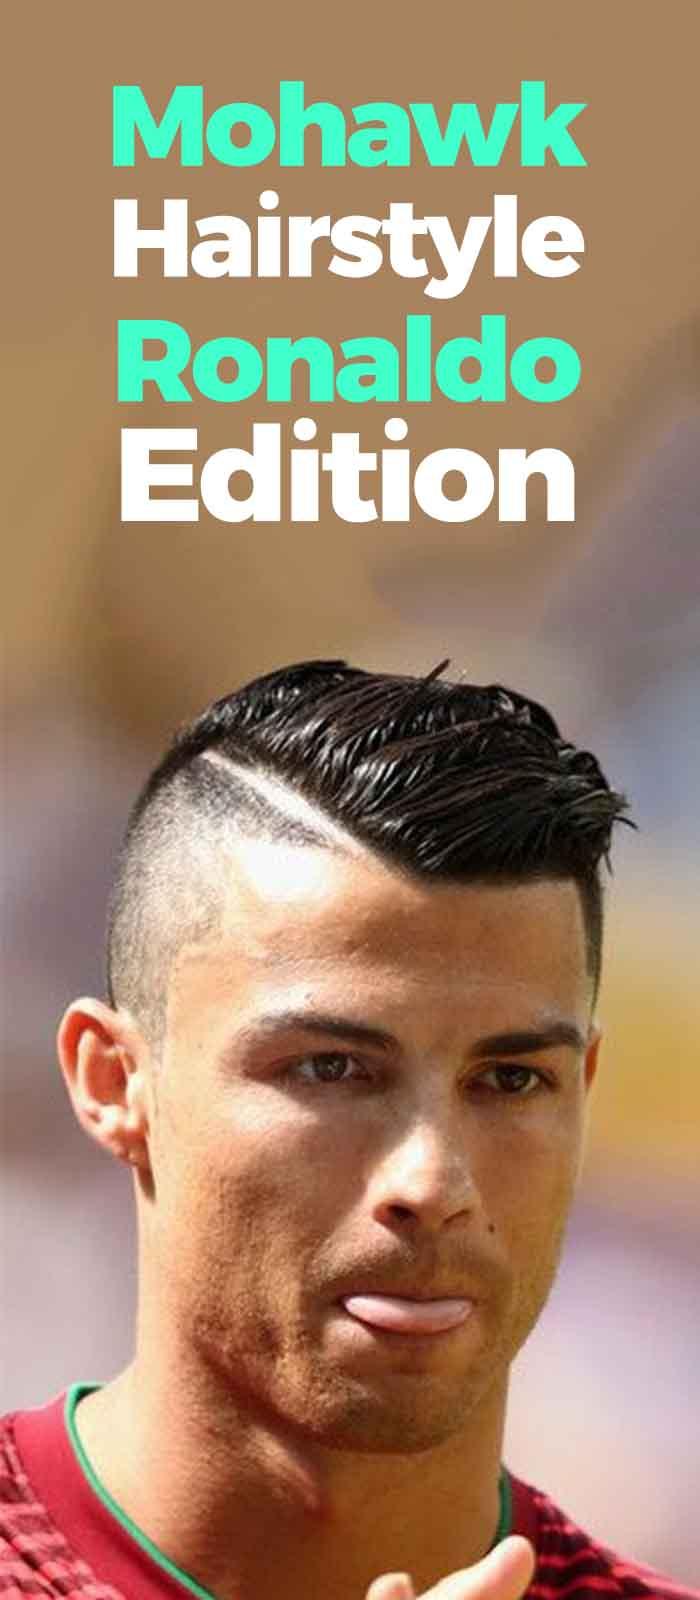 Mohawk Hairstyle – Cristiano Ronaldo Edition